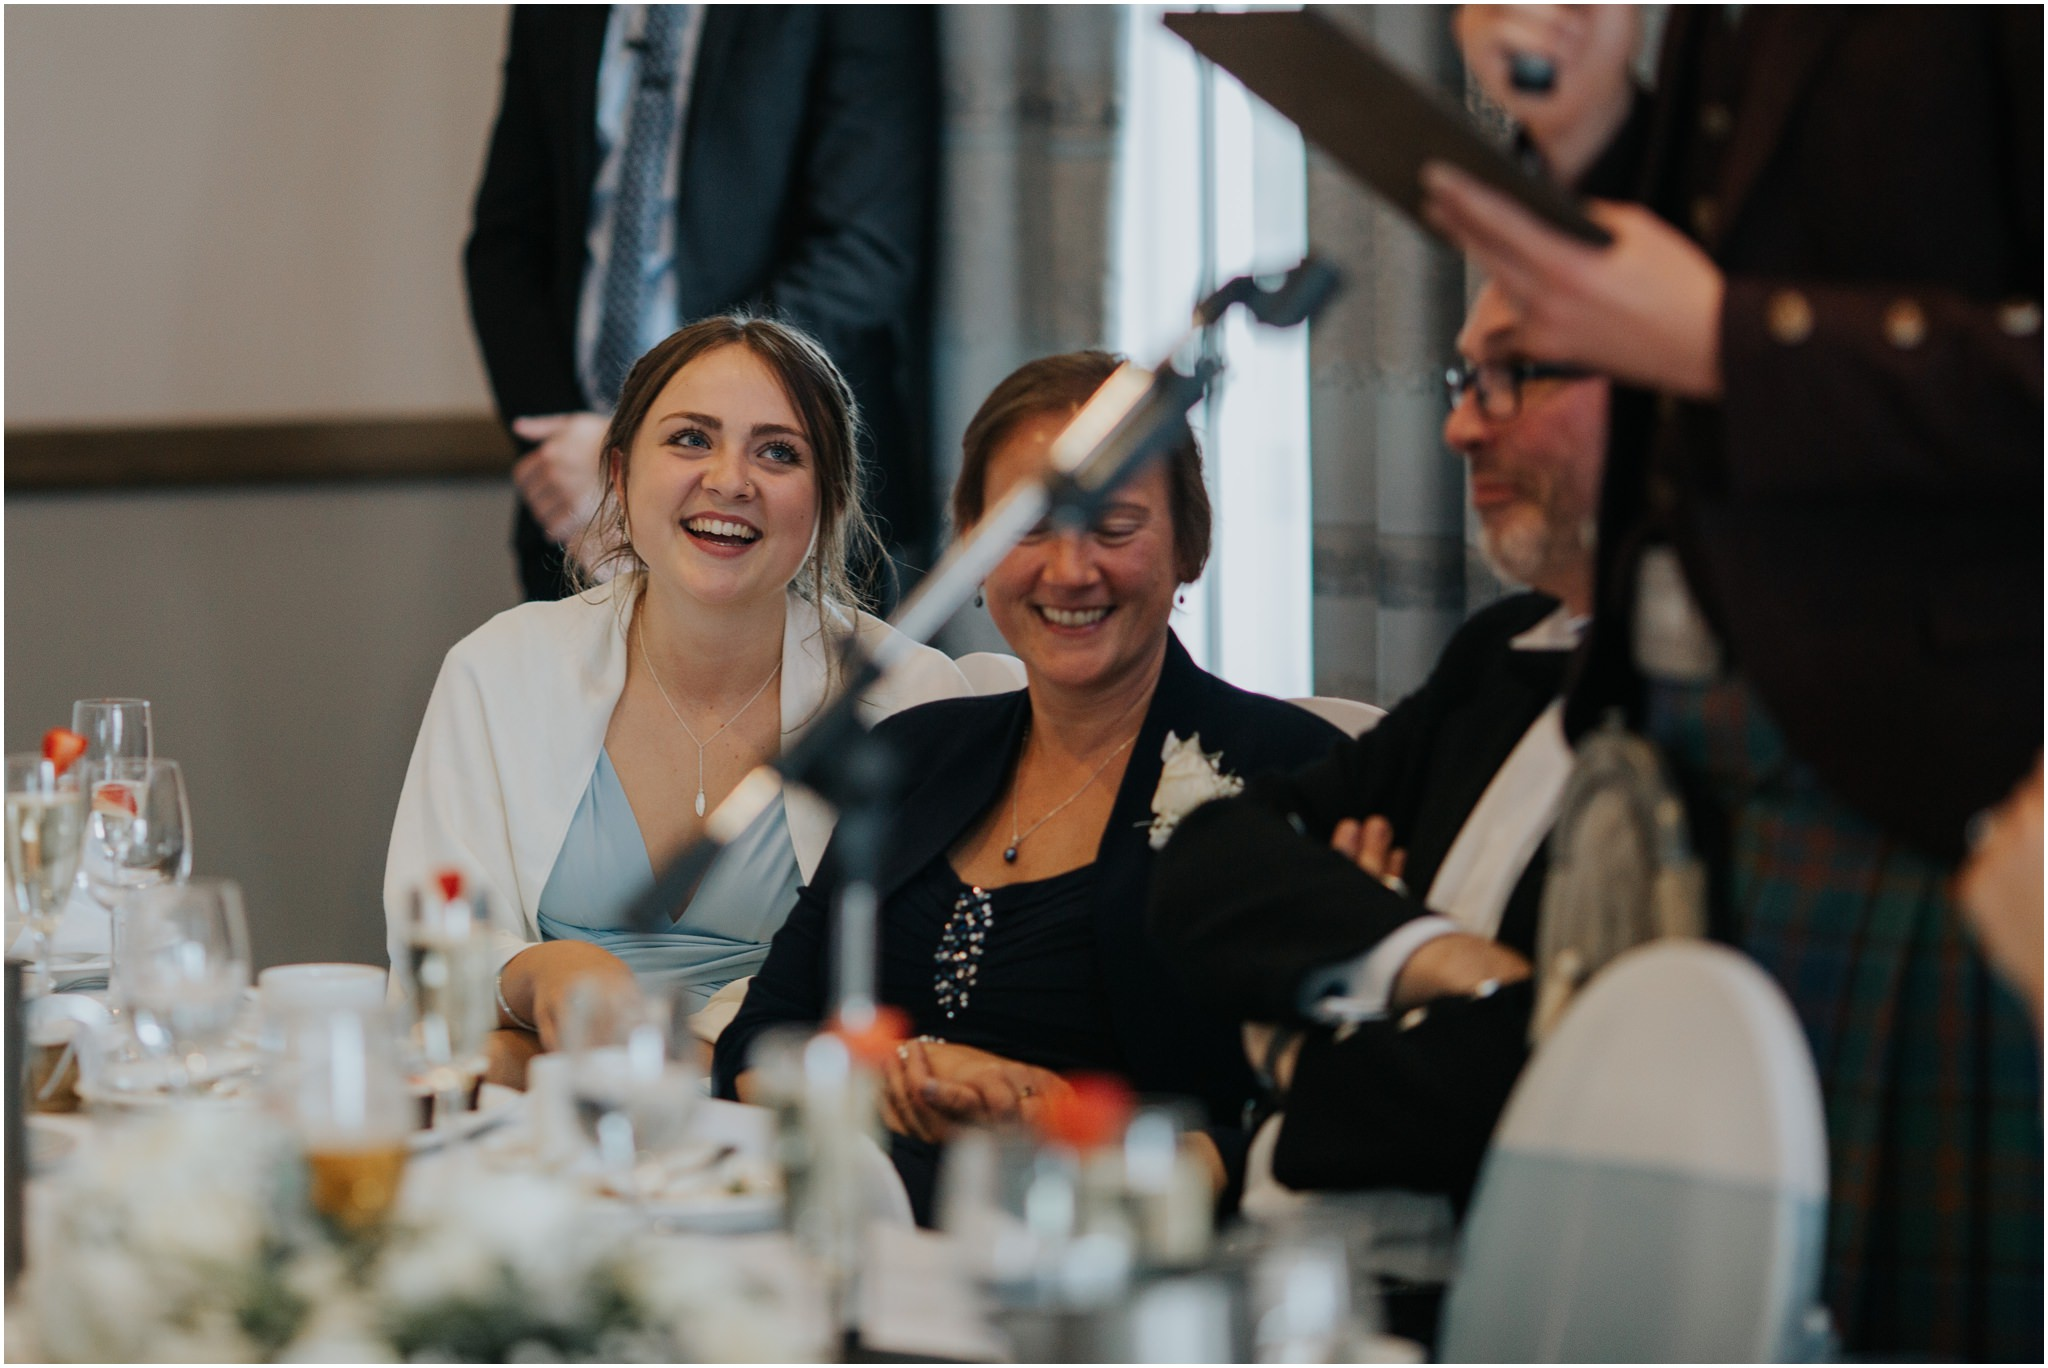 Photography 78 - Glasgow Wedding Photographer - Jordan & Abi - The Waterside Hotel, West Kilbride_0116.jpg